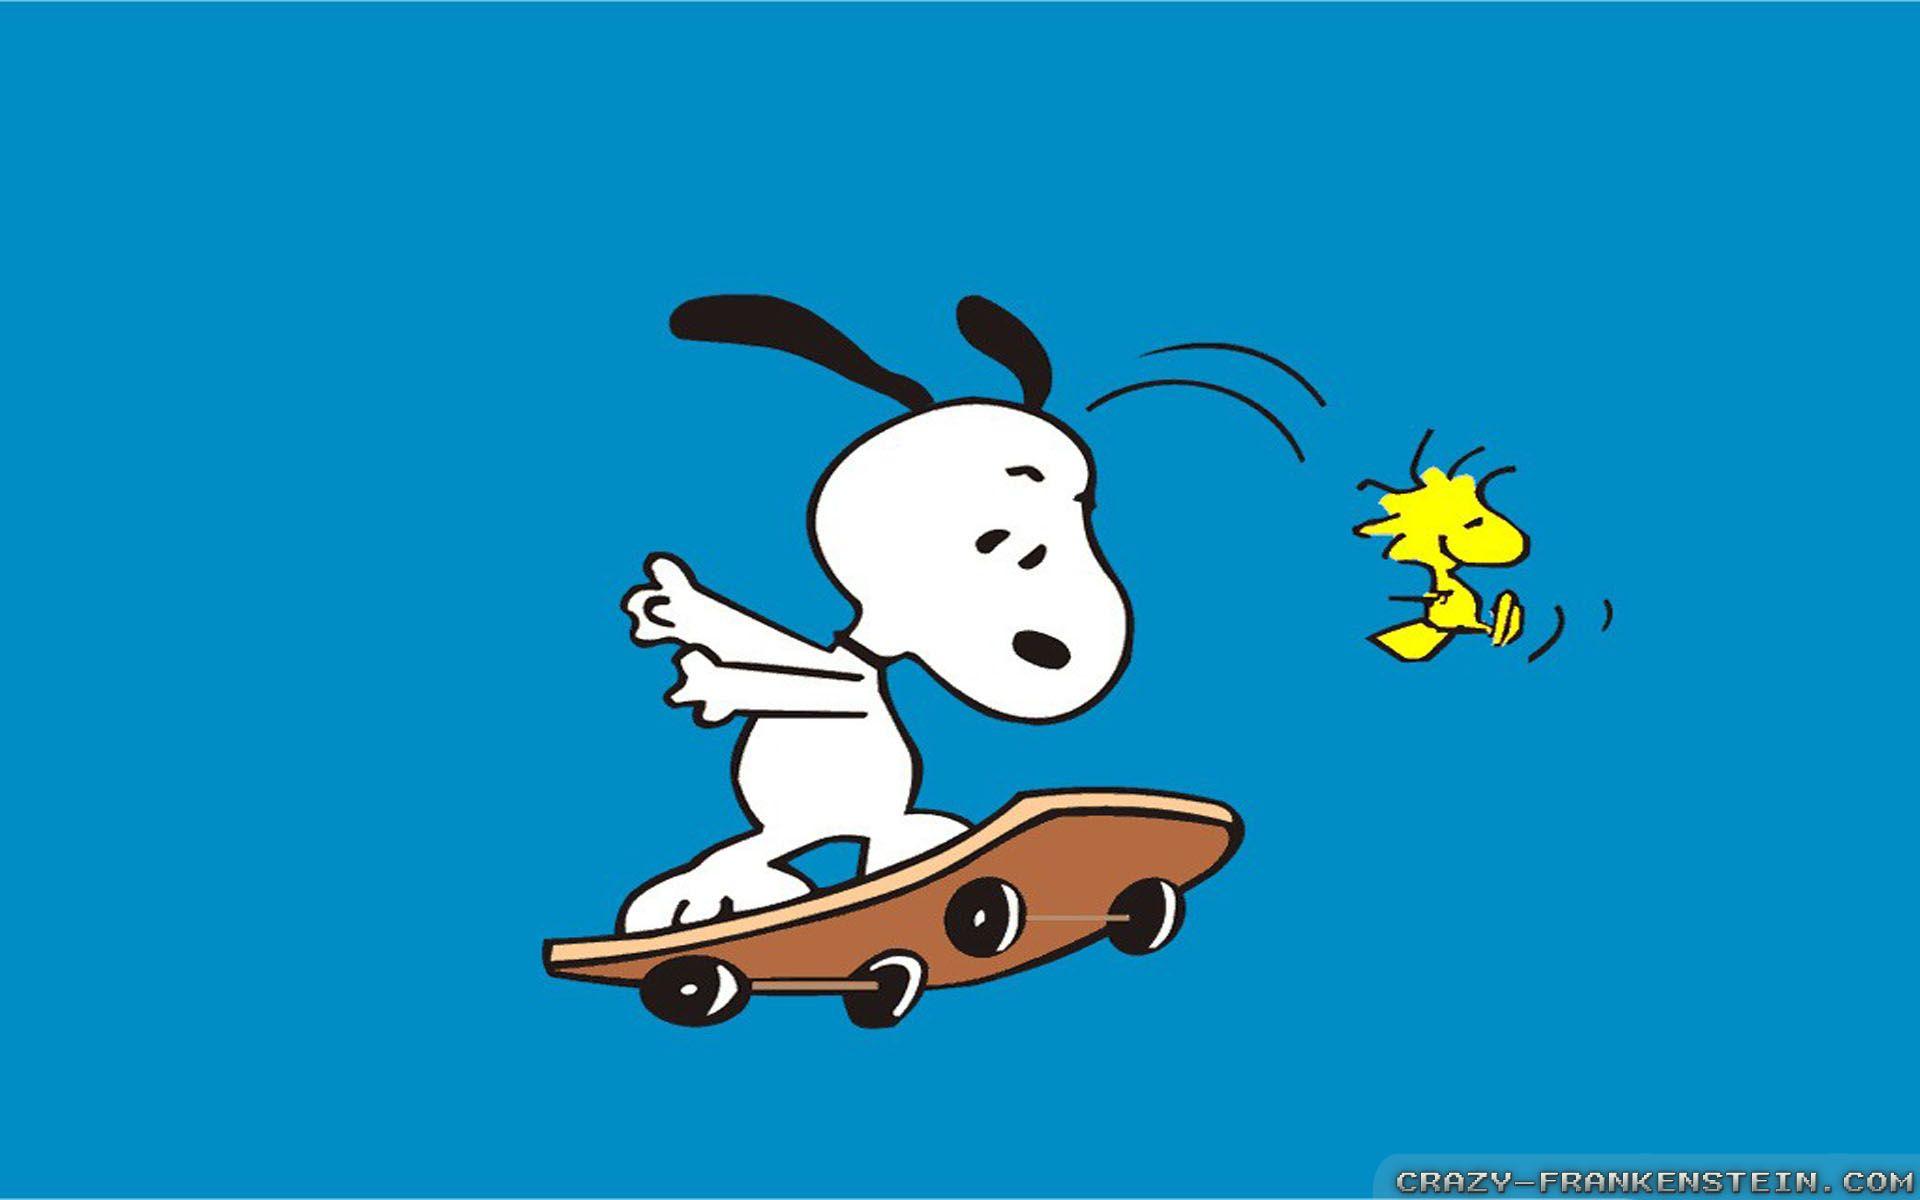 Snoopy Wallpaper Pesquisa Google スヌーピー スヌーピー 愛 スヌーピーの壁紙